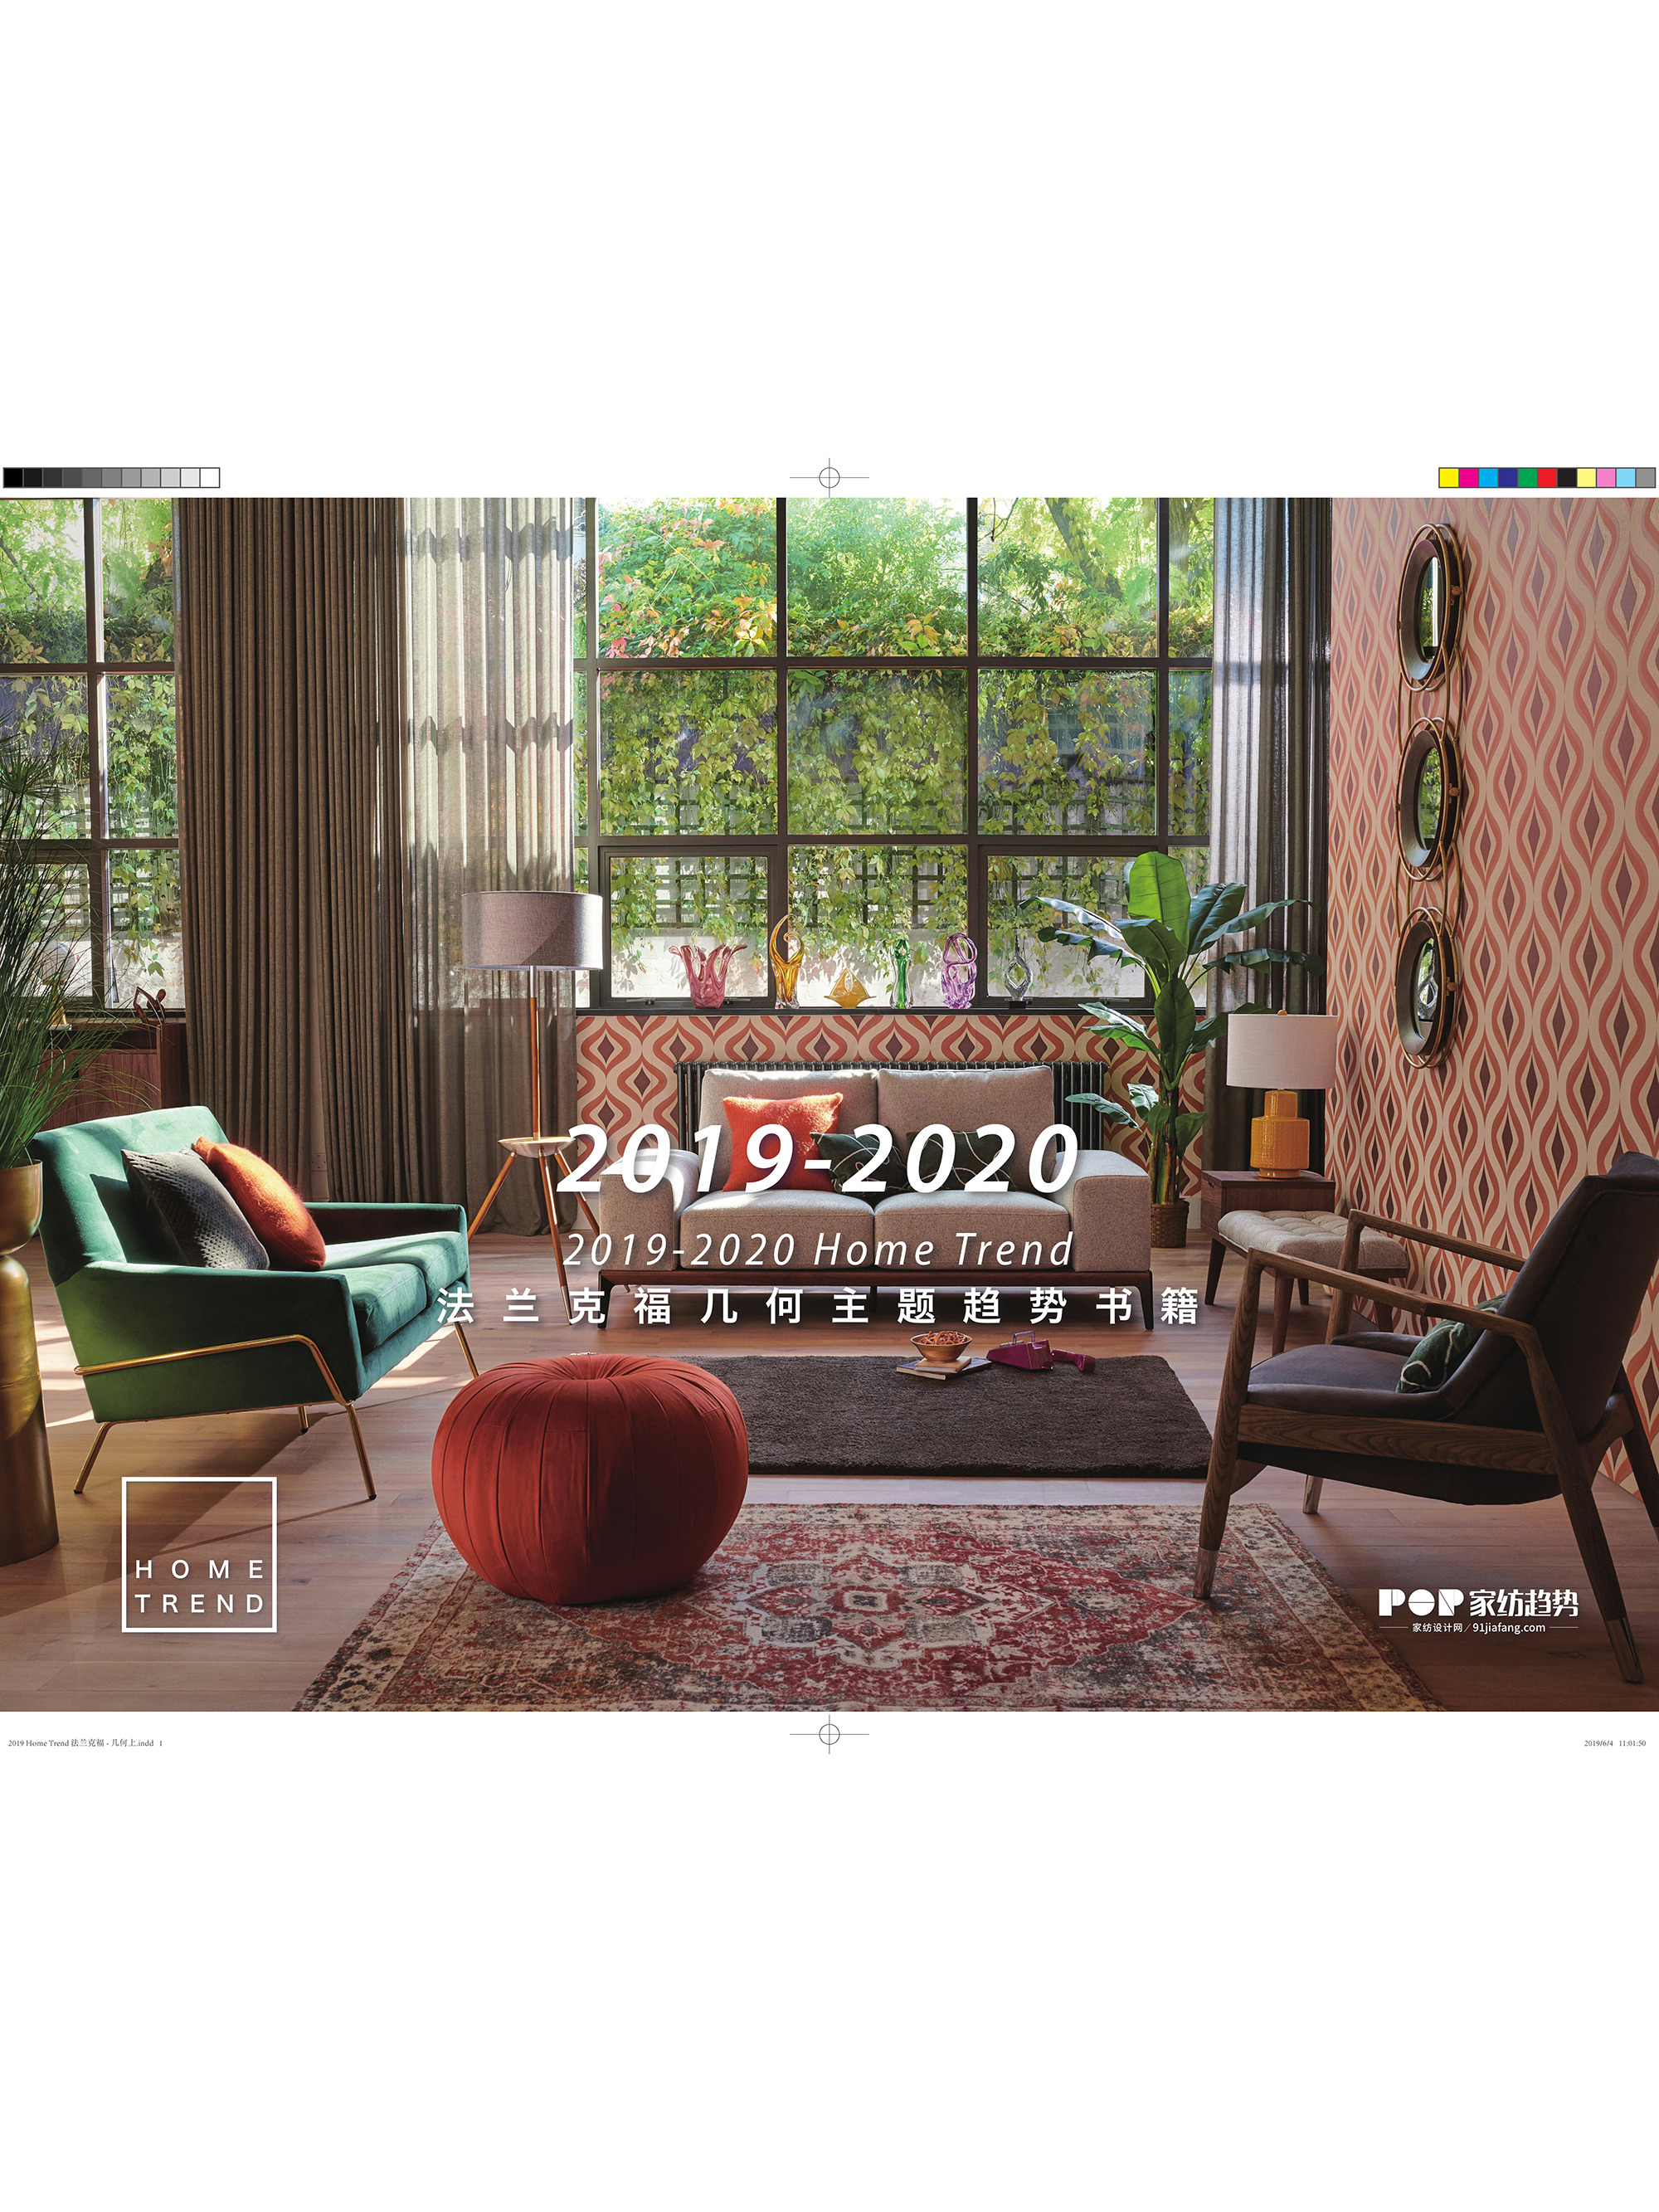 《HOME TREND》2019-2020法兰克福几何主题趋势书籍(四)